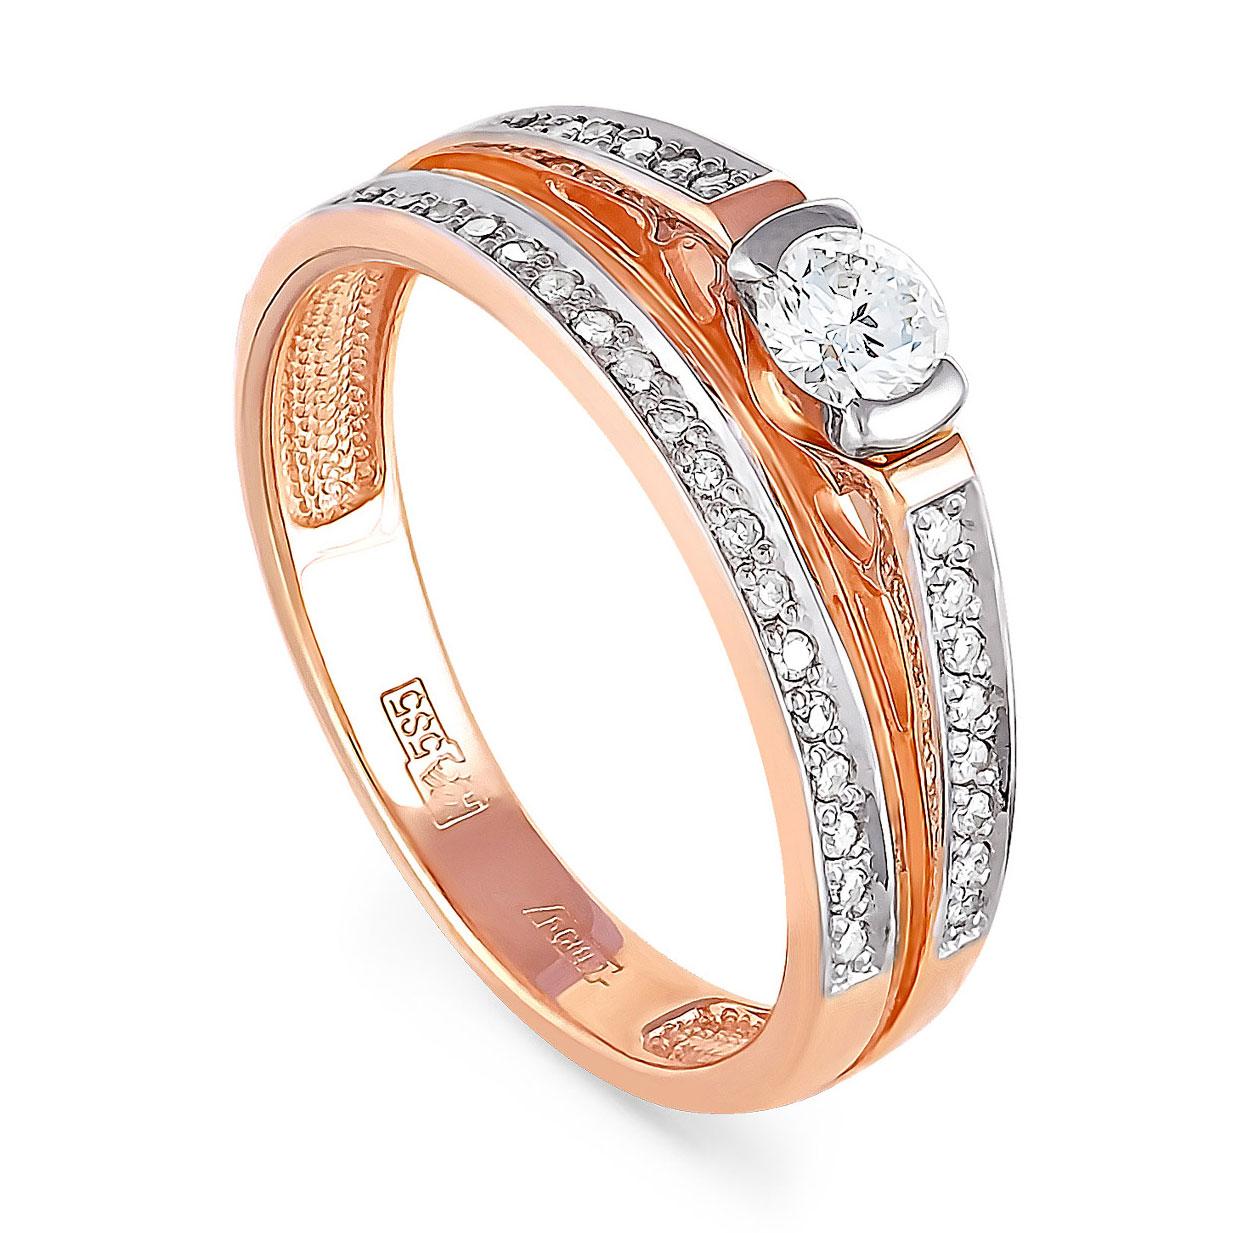 Золотое кольцо Бриллиант арт. 1-0325-1000 1-0325-1000